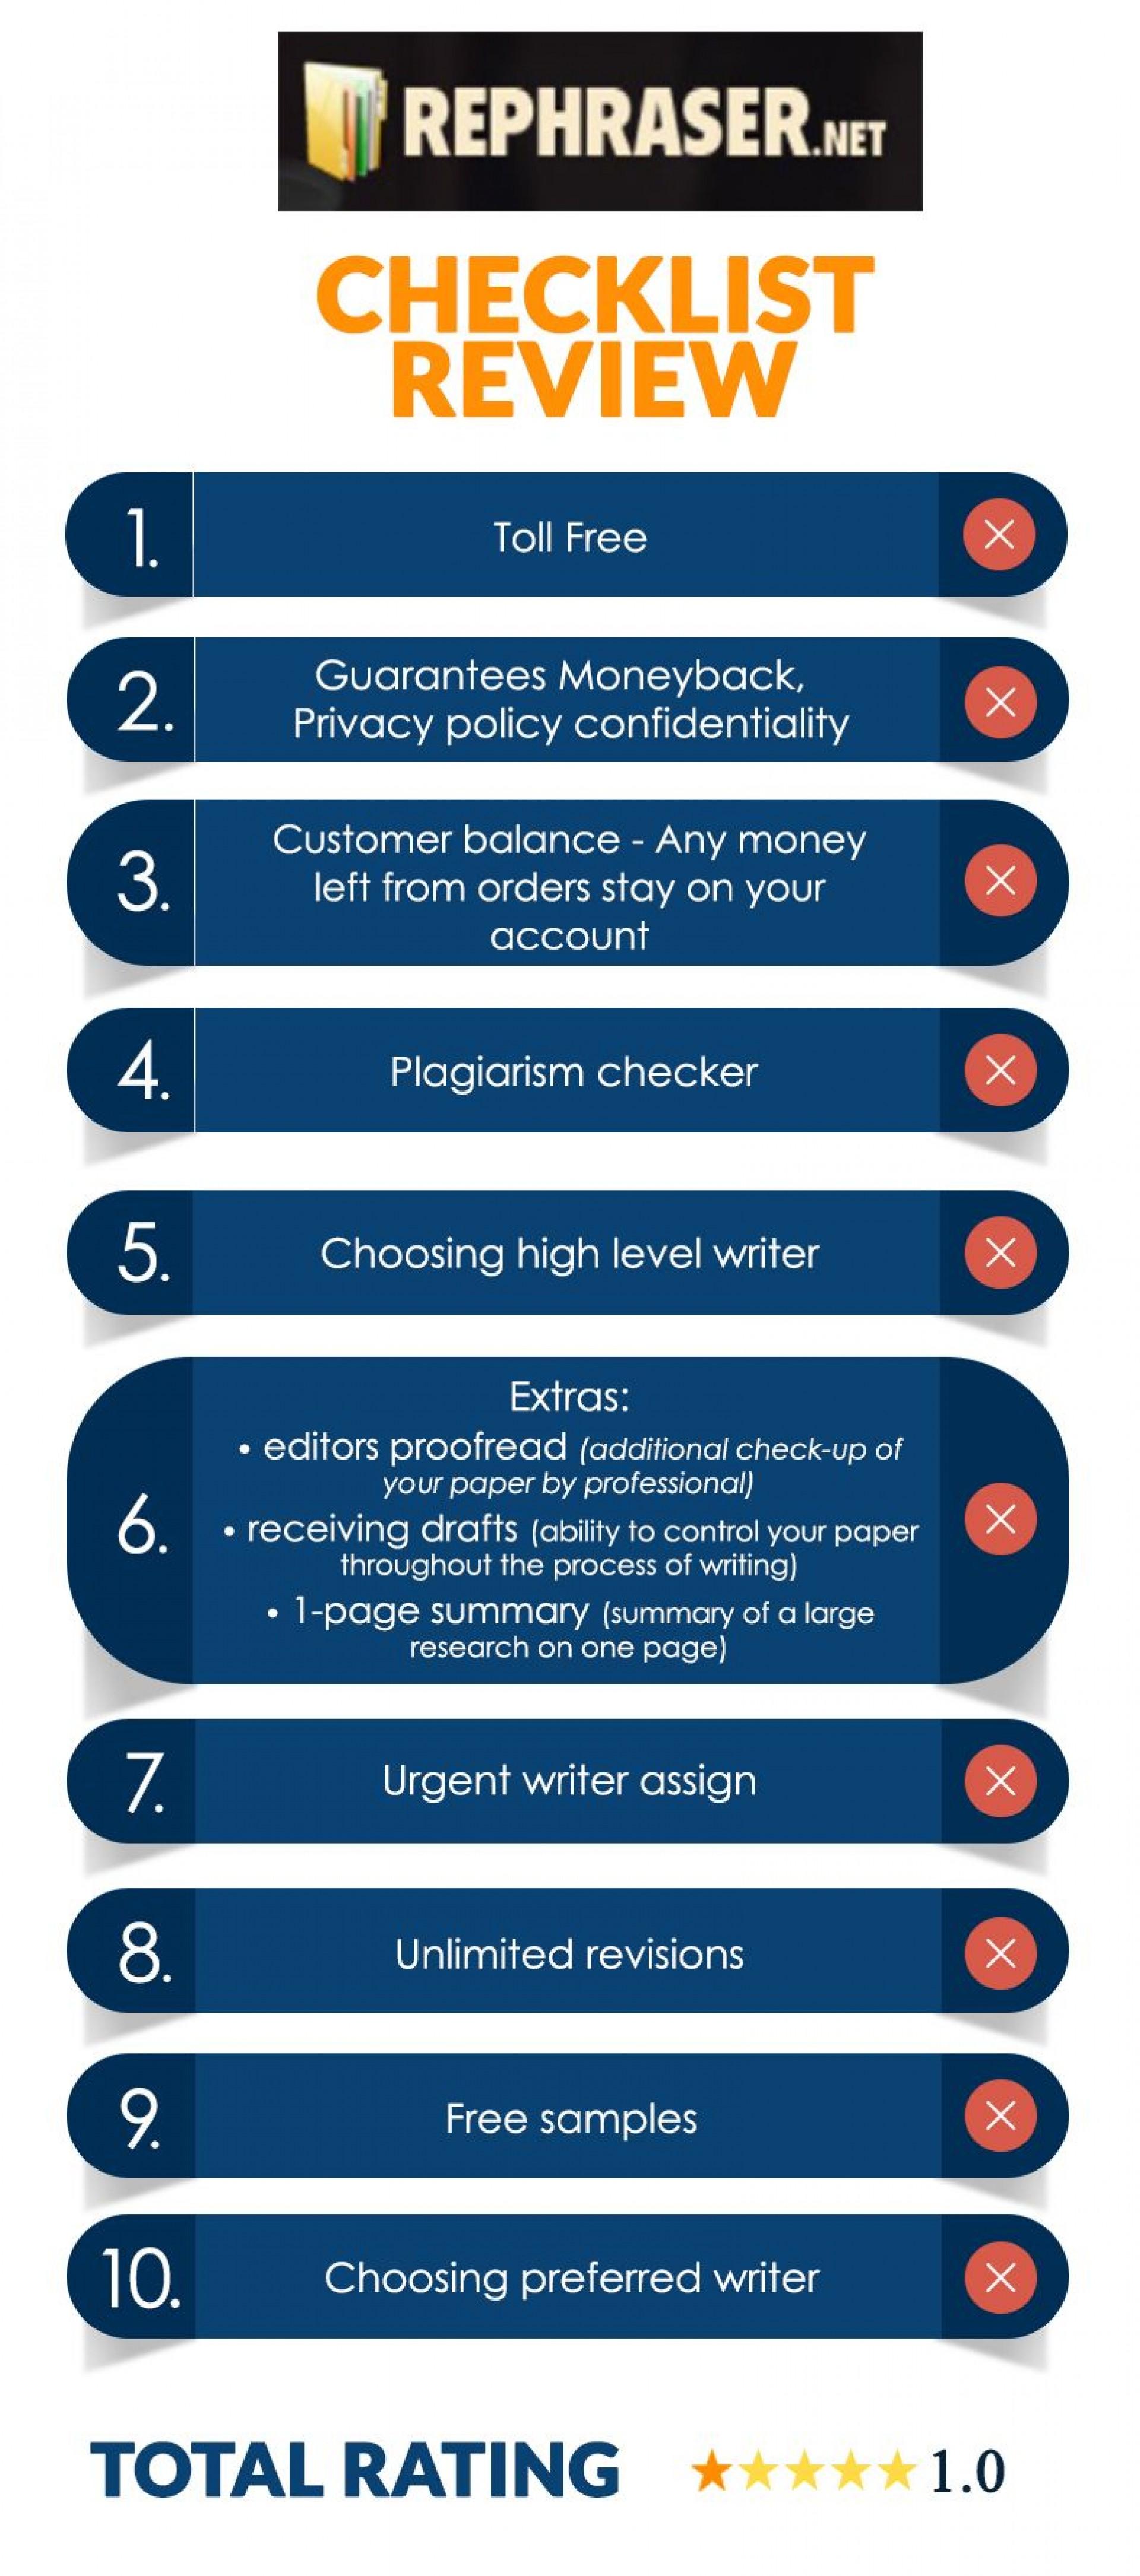 009 Essay Checker Free Online Amazing Sentence Grammar Plagiarism Document 1920